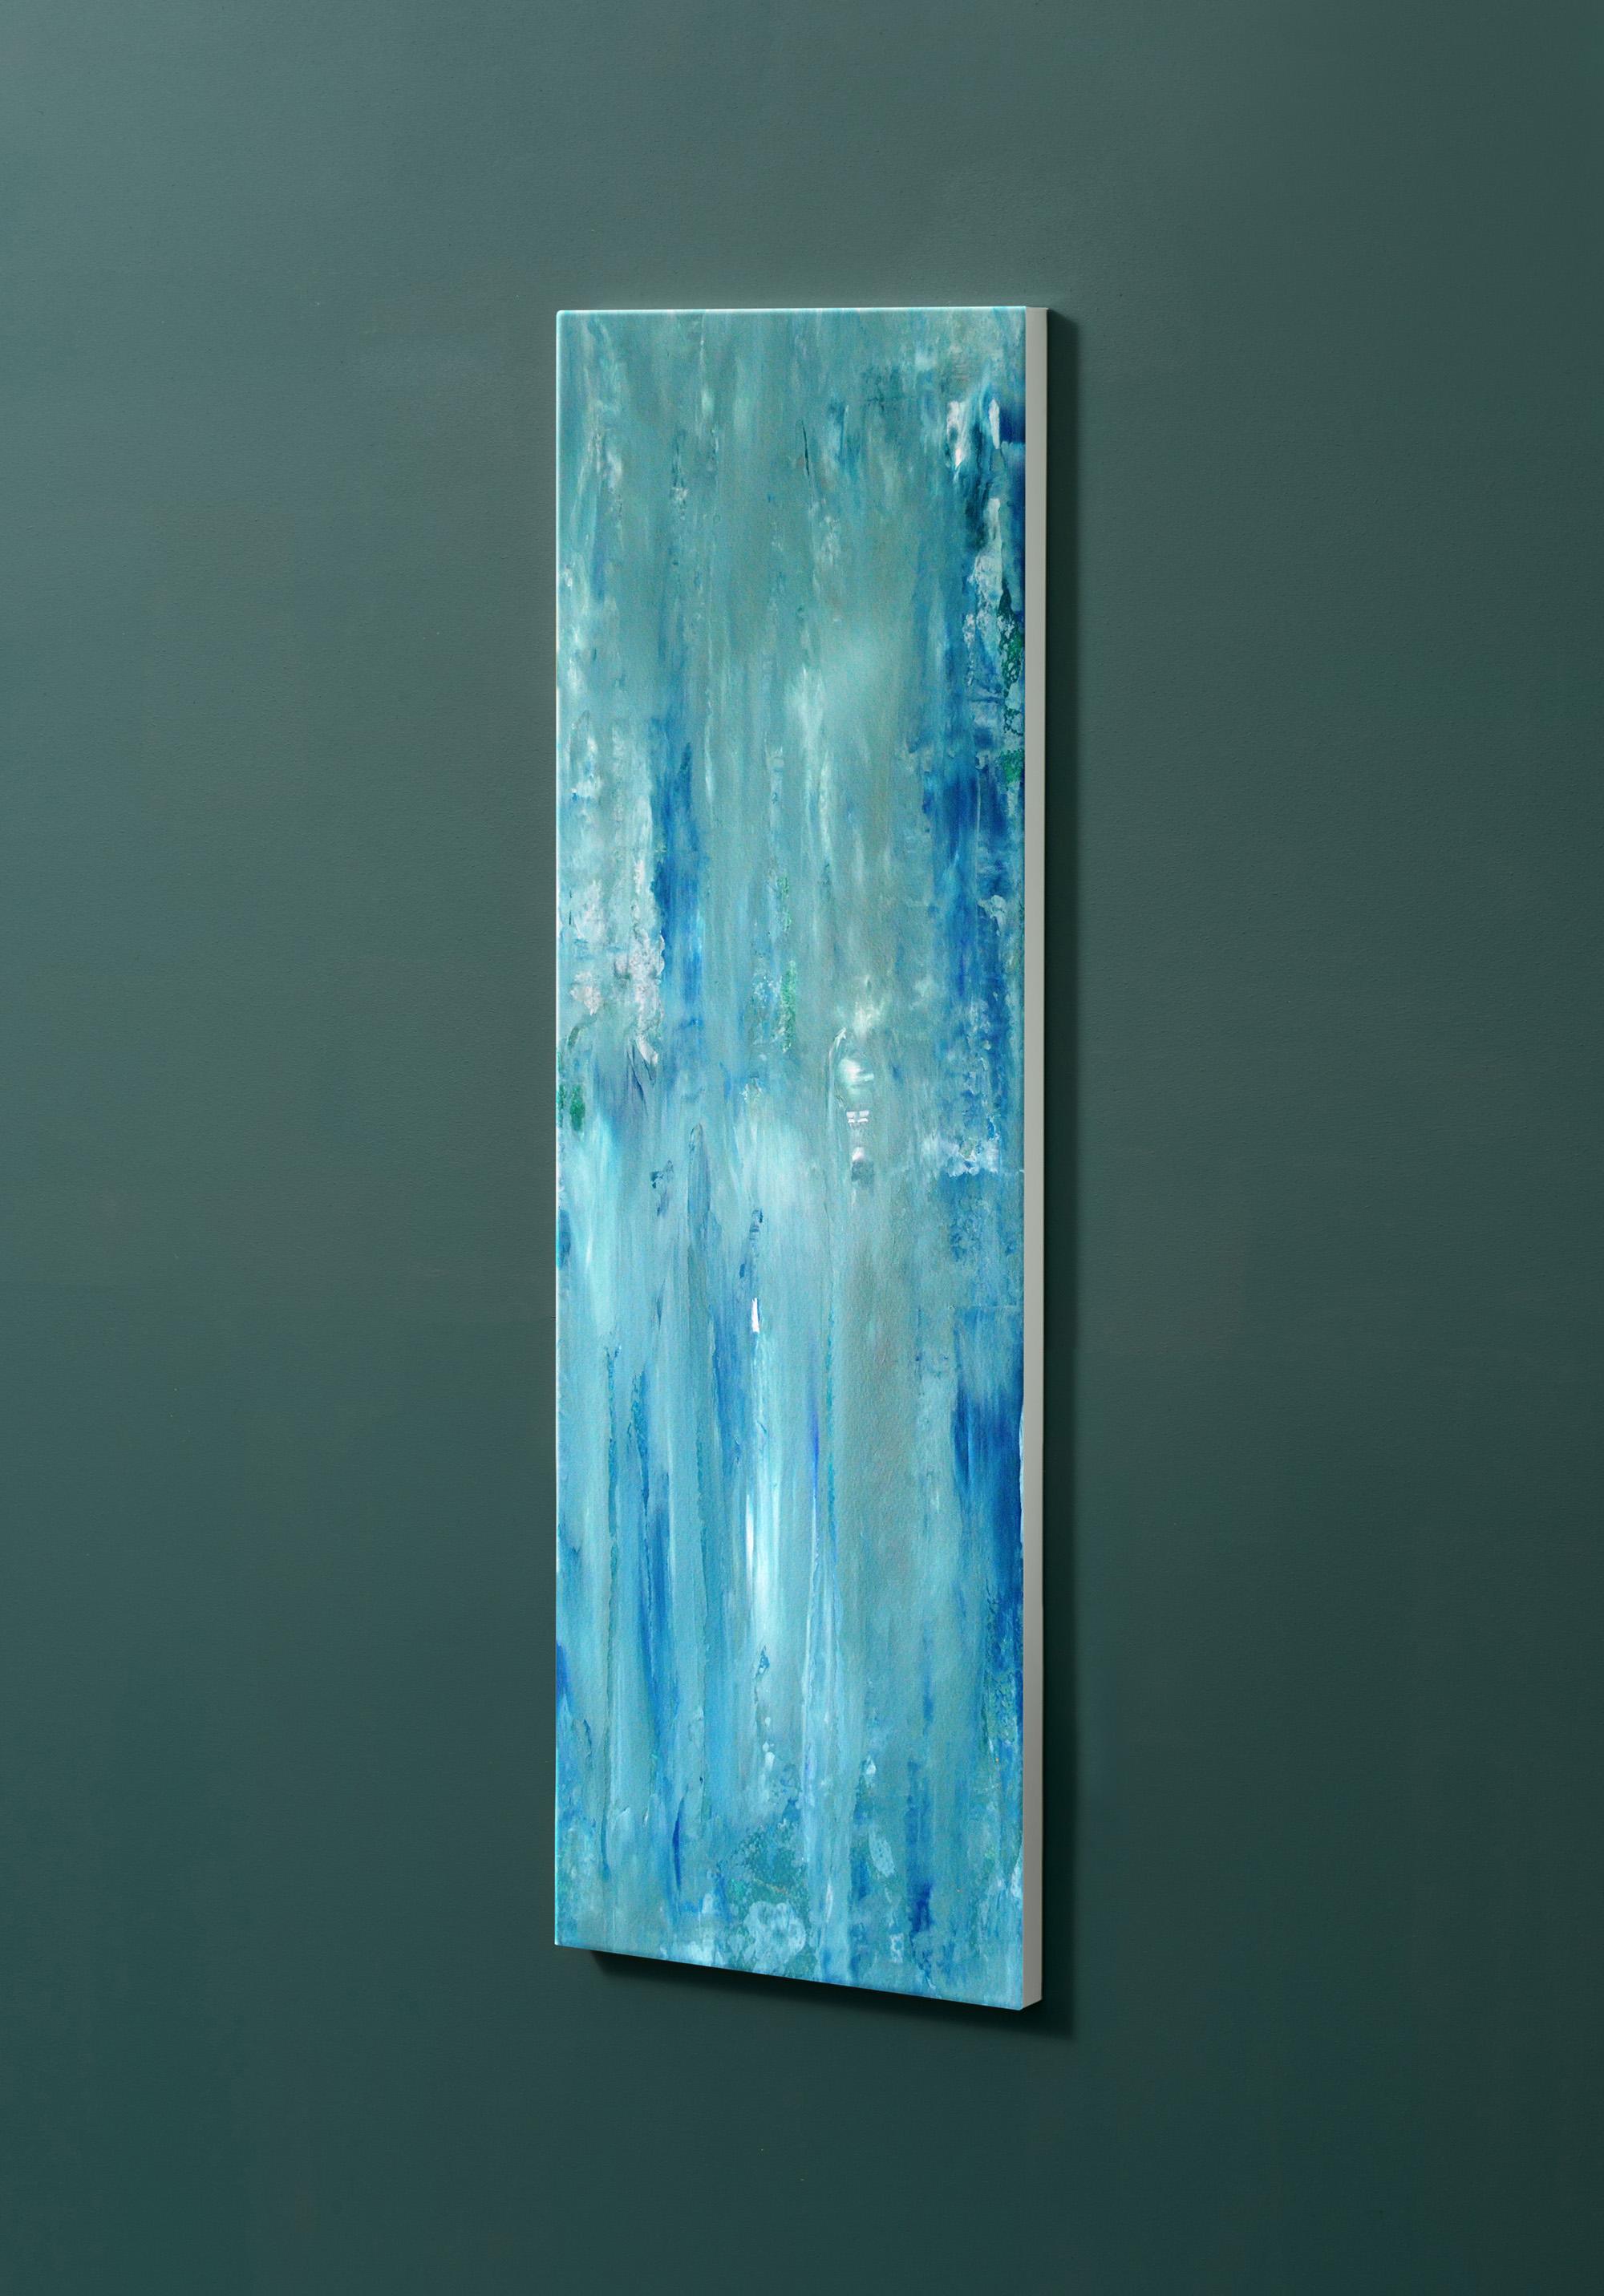 Magnettafel NOTIZ 30x90cm Motiv-Pinnwand M36 Abstrakt Kunst